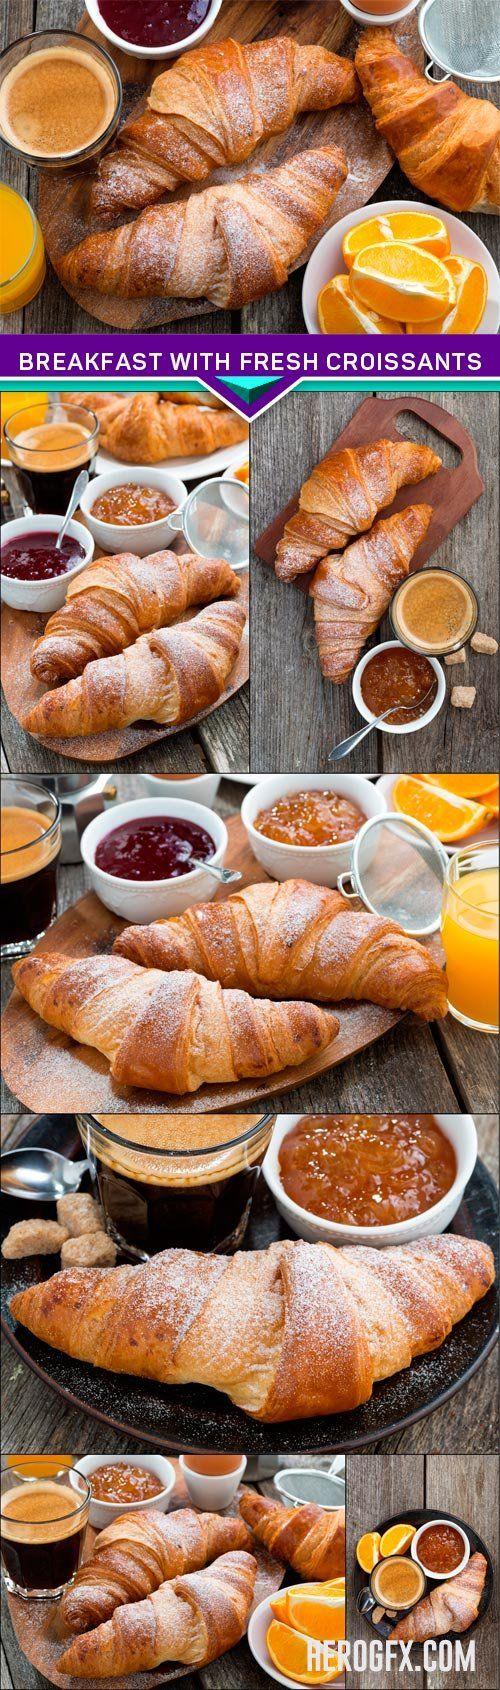 Breakfast with fresh croissants 7x JPEG